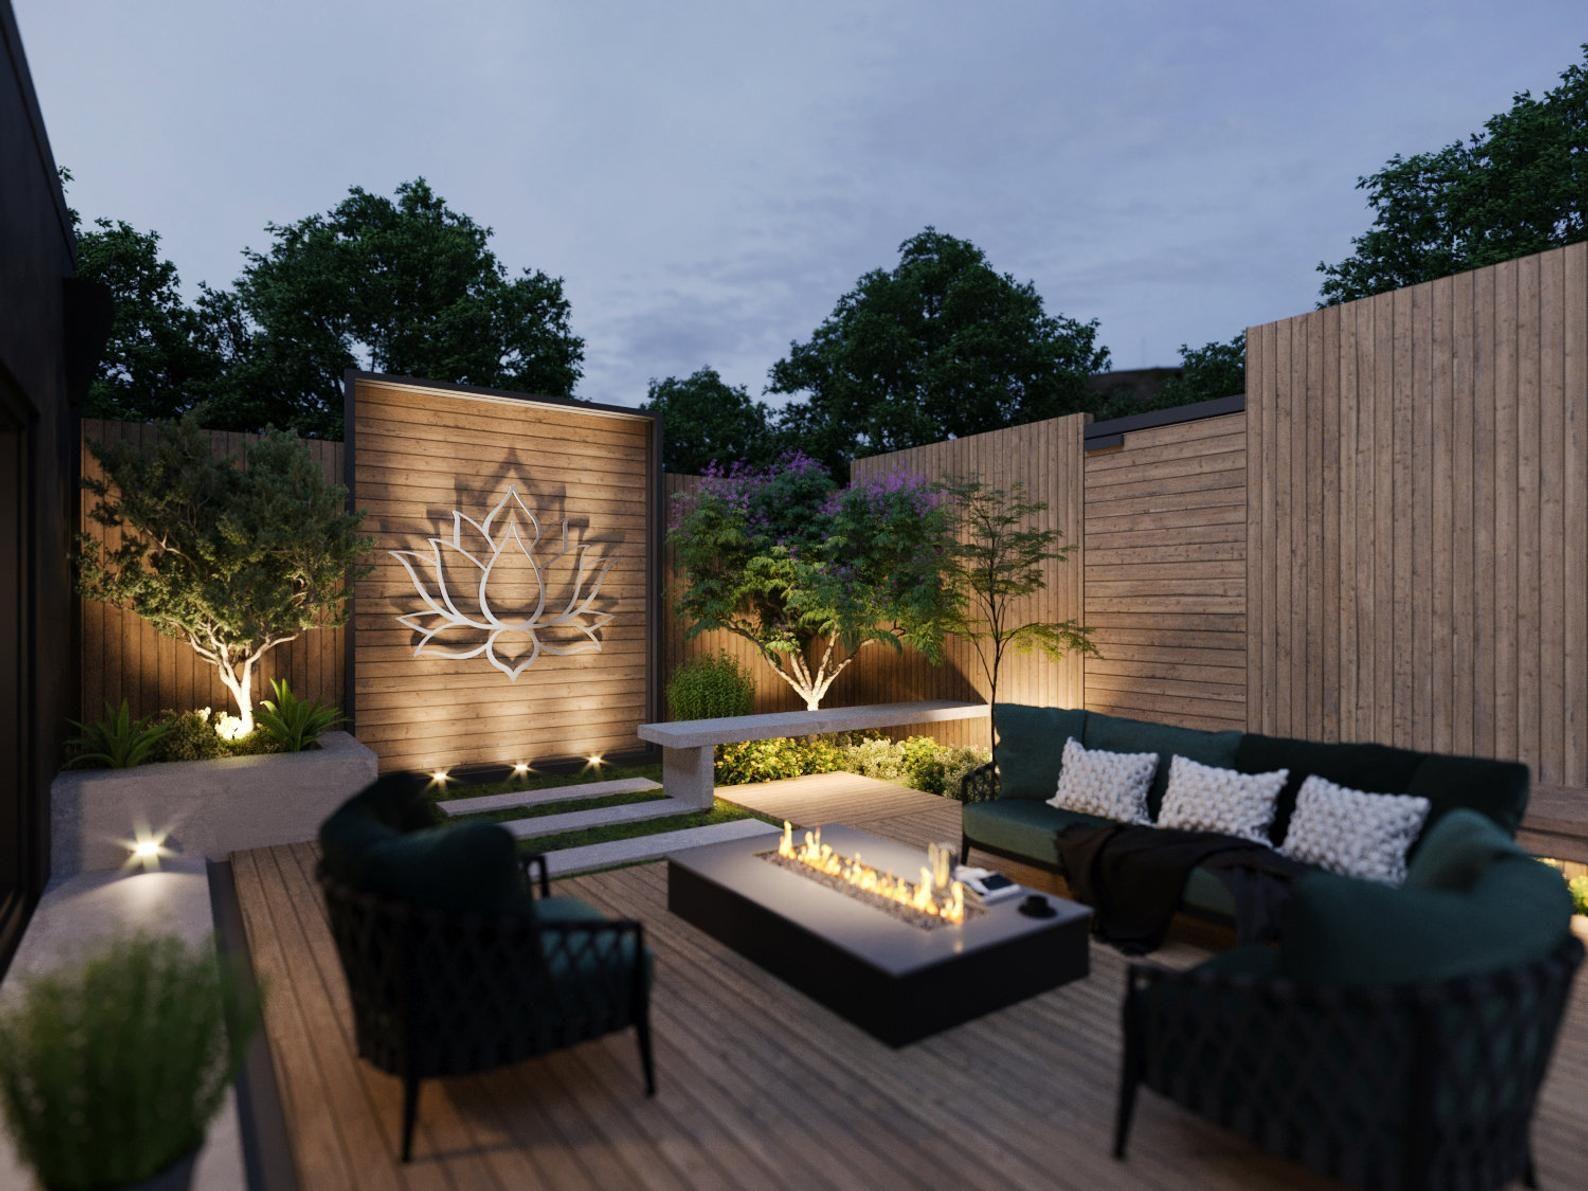 Photo of Lotus Flower Large Outdoor Metal Wall Art, Garden Sculpture, Zen Decor, Modern Outdoor Wall Art, Yoga Wall Art, Silver Wall Art